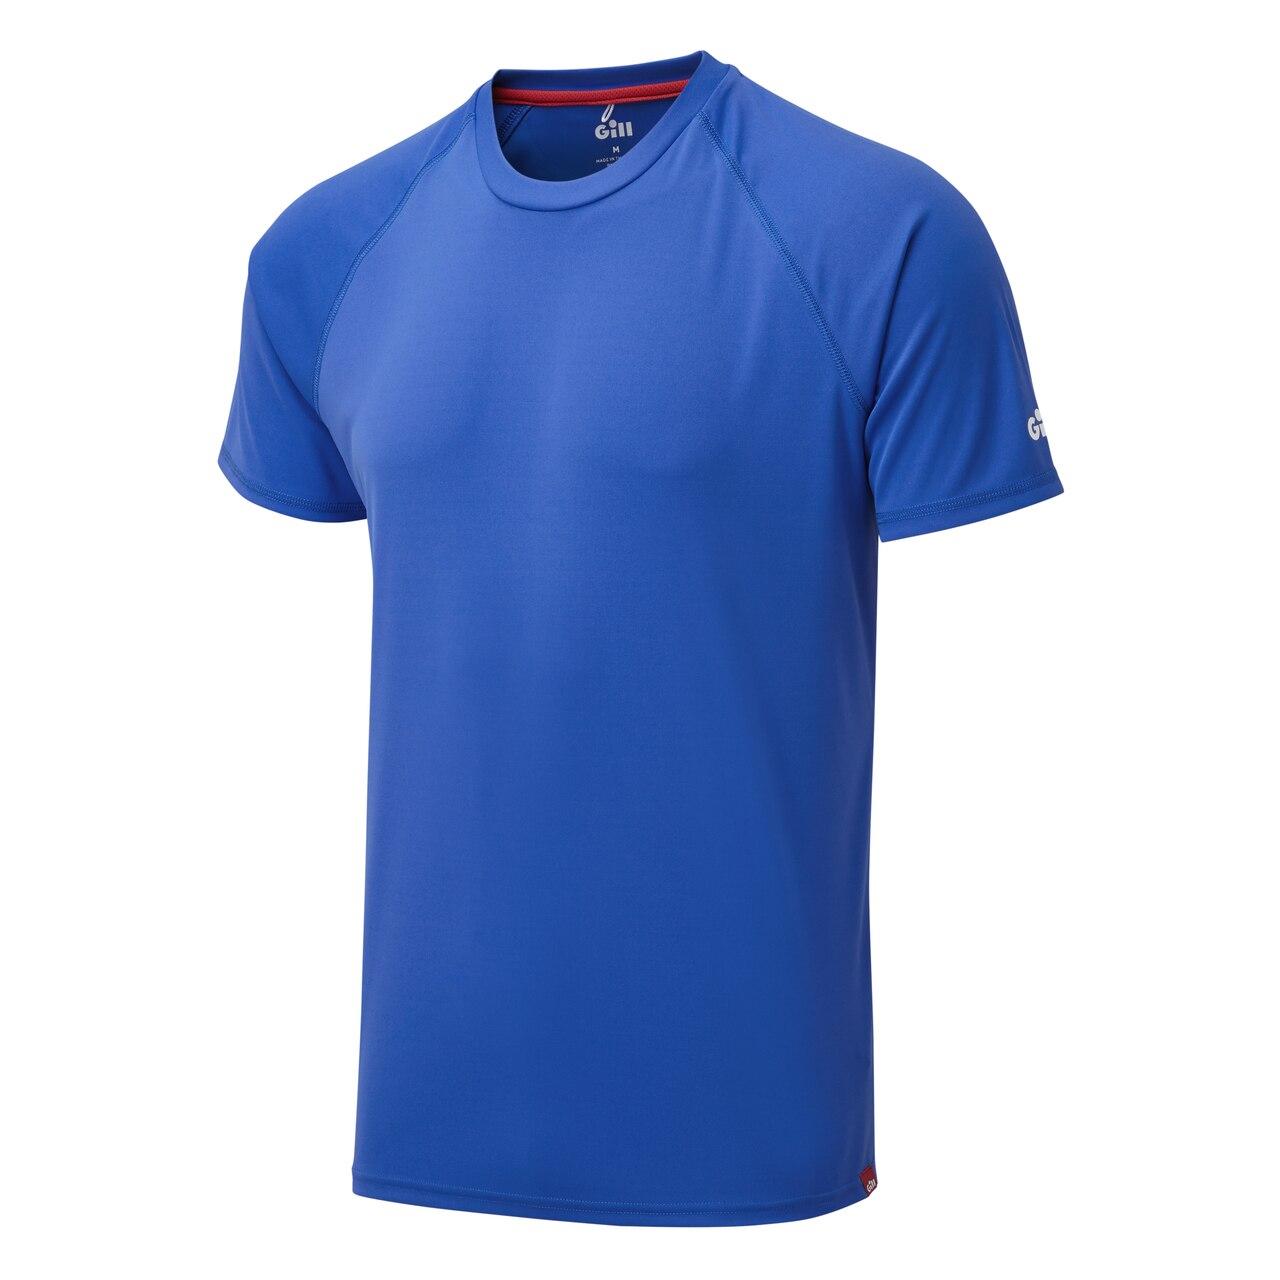 Men's UV Tec Tee - UV010-BLU01-2.jpg